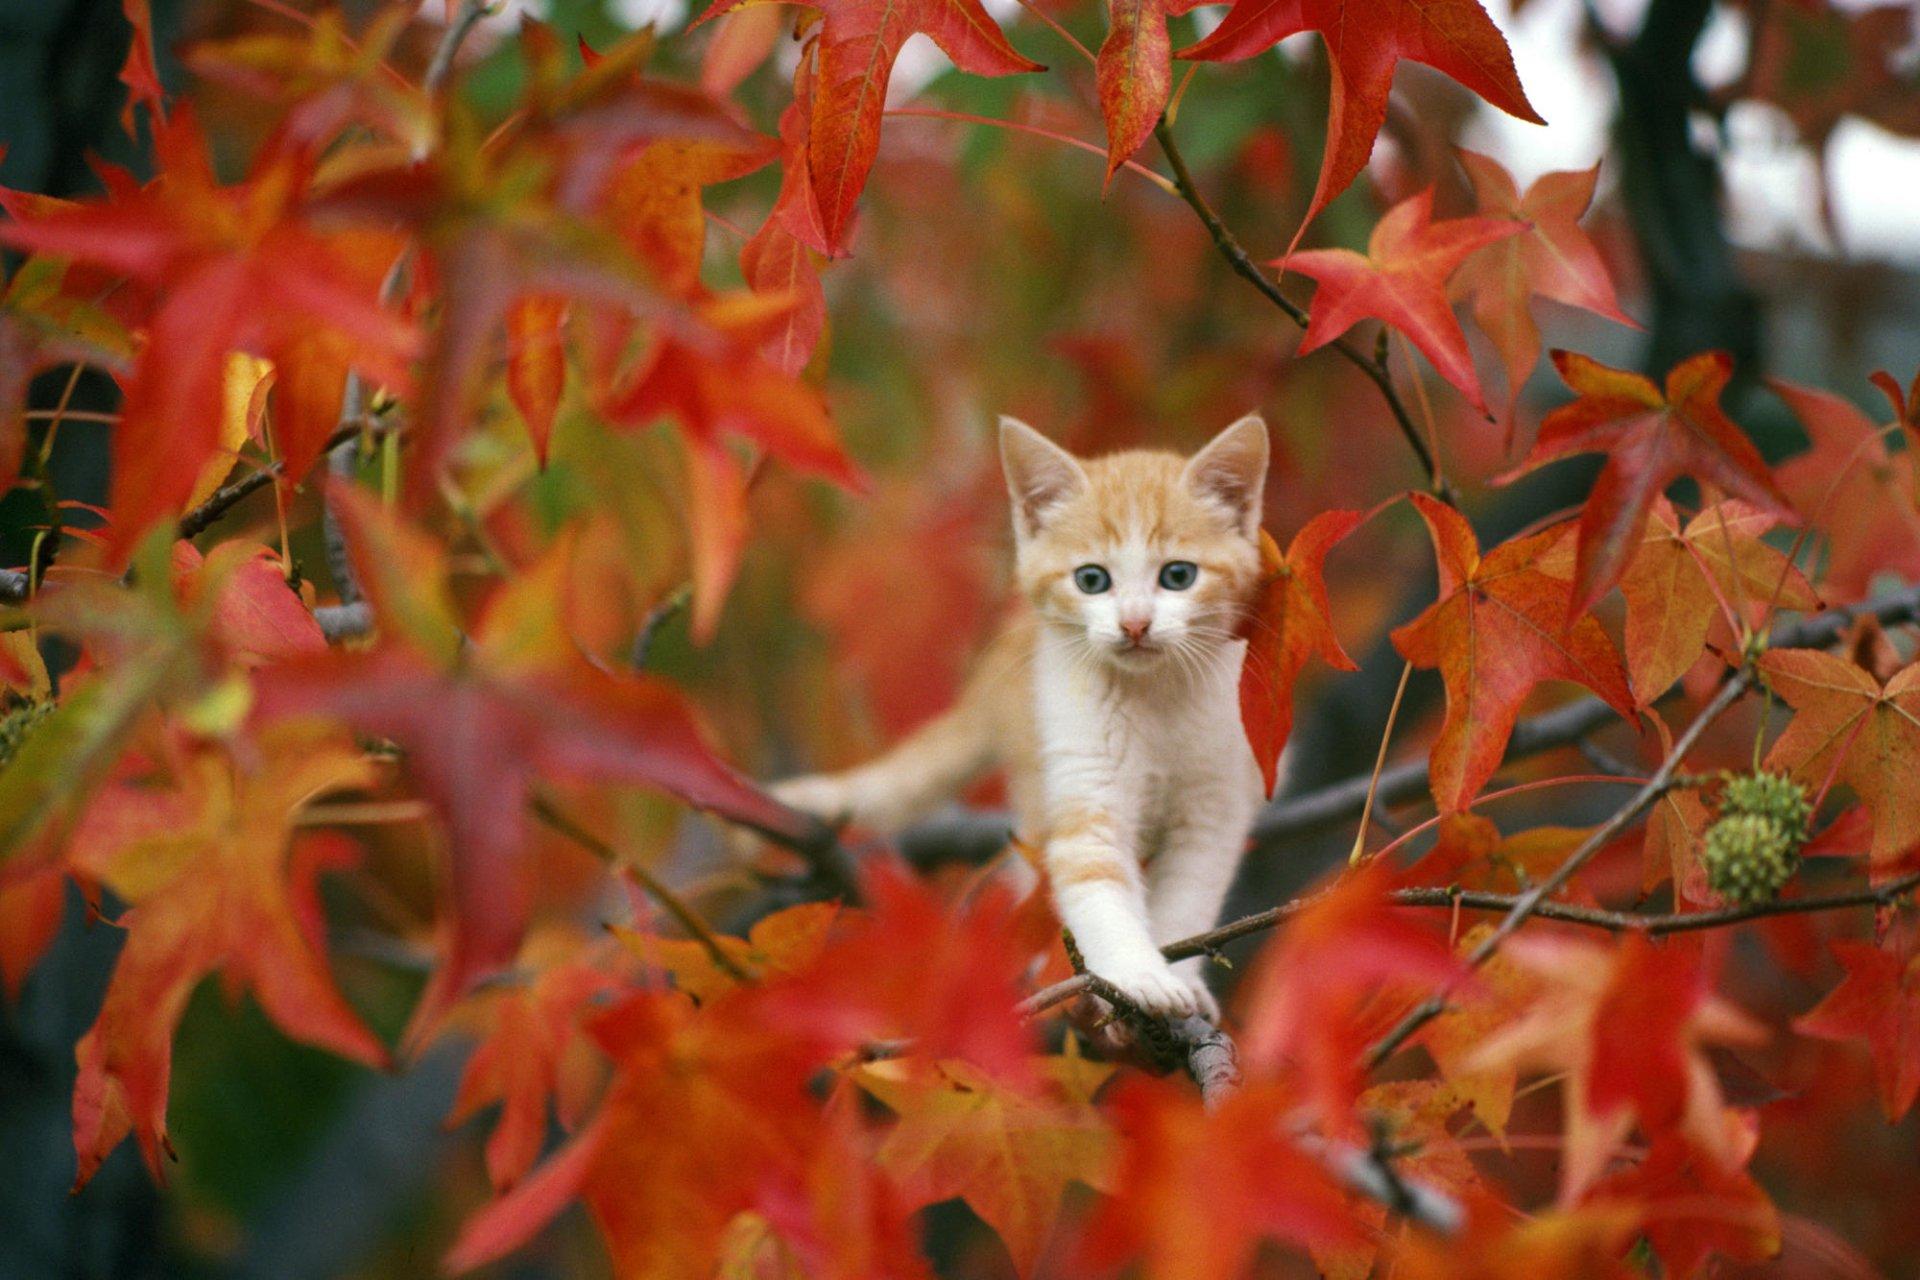 Animaux - Chat  Baby Animal Feuille Automne Fond d'écran